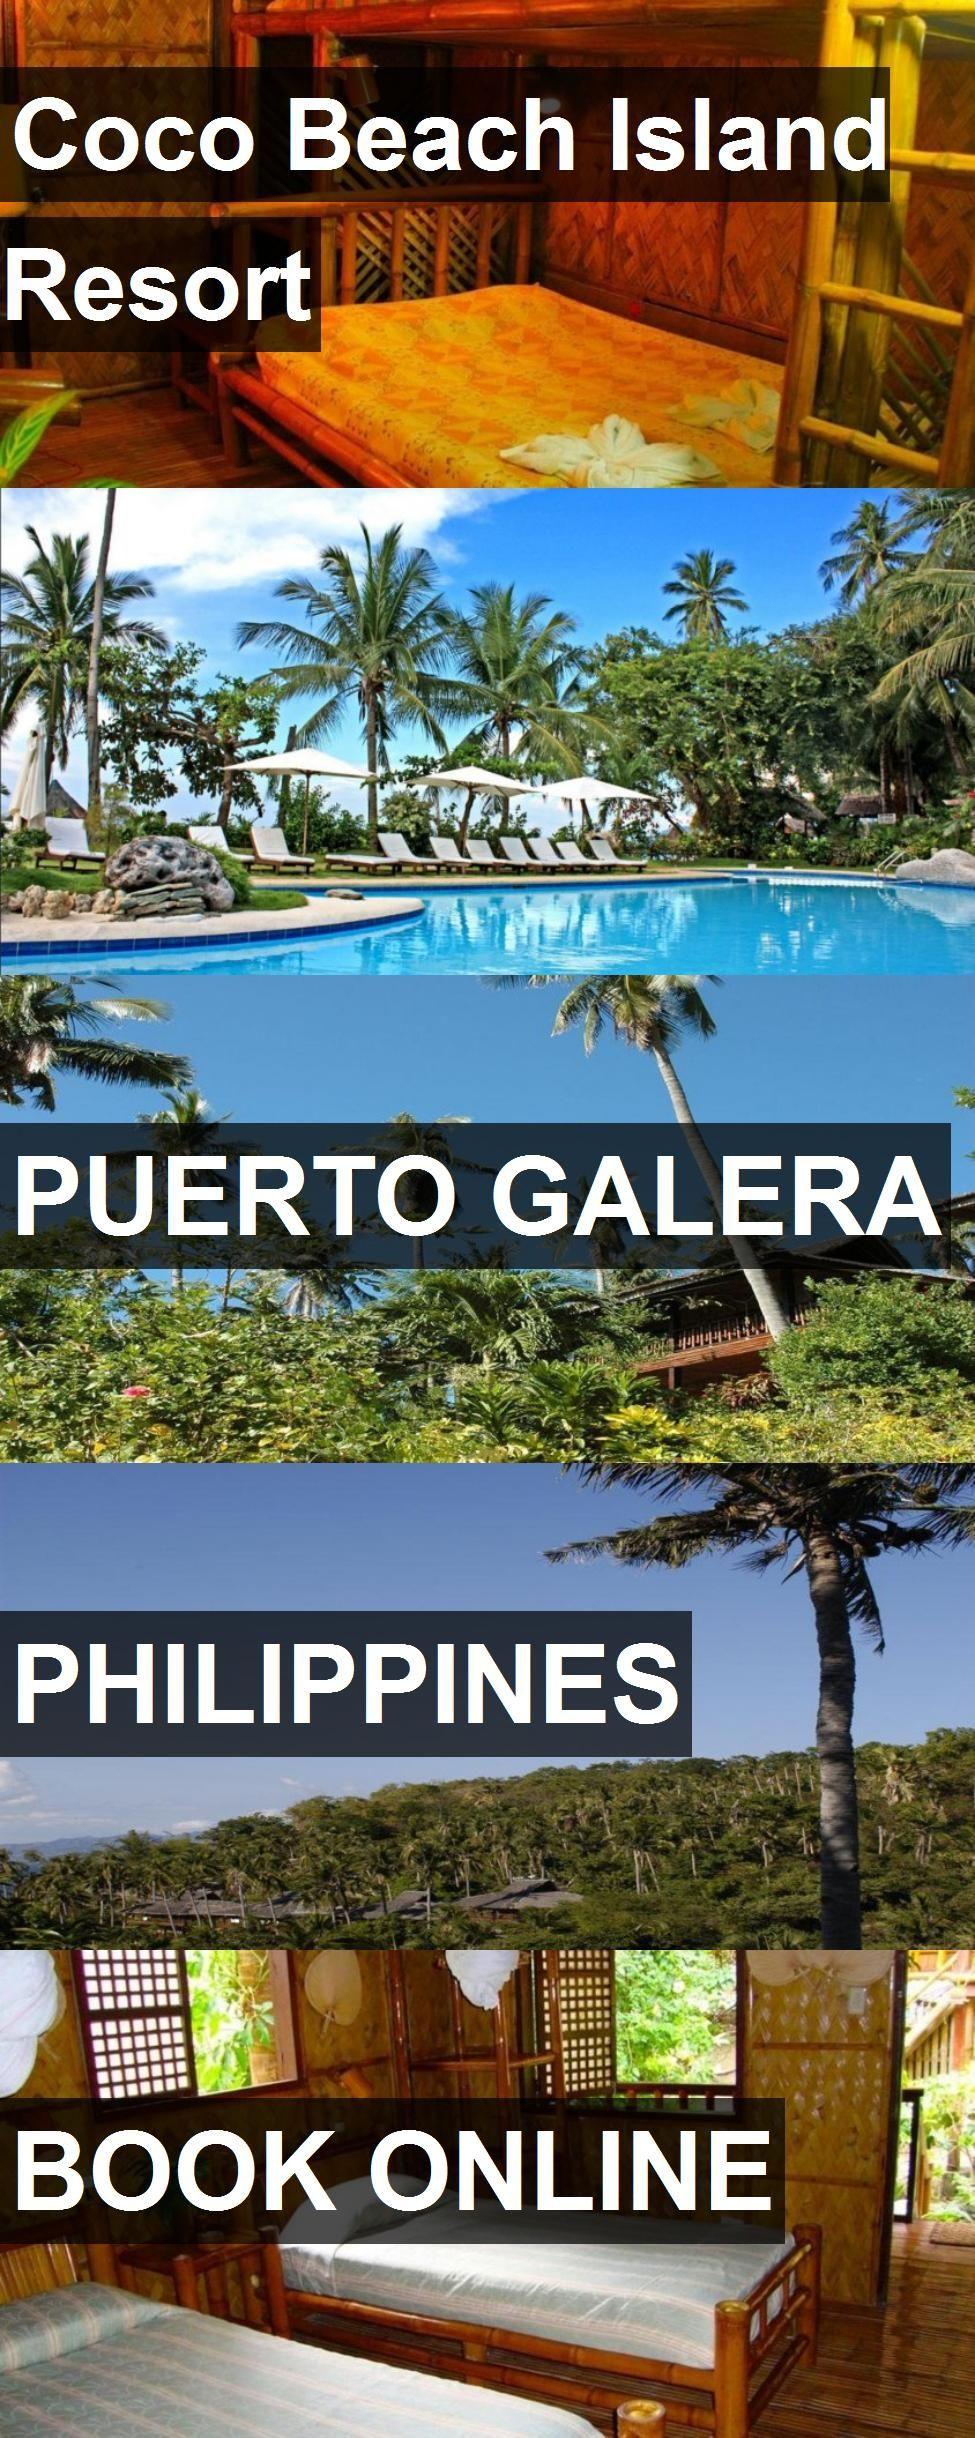 Hotel Coco Beach Island Resort in Puerto Galera